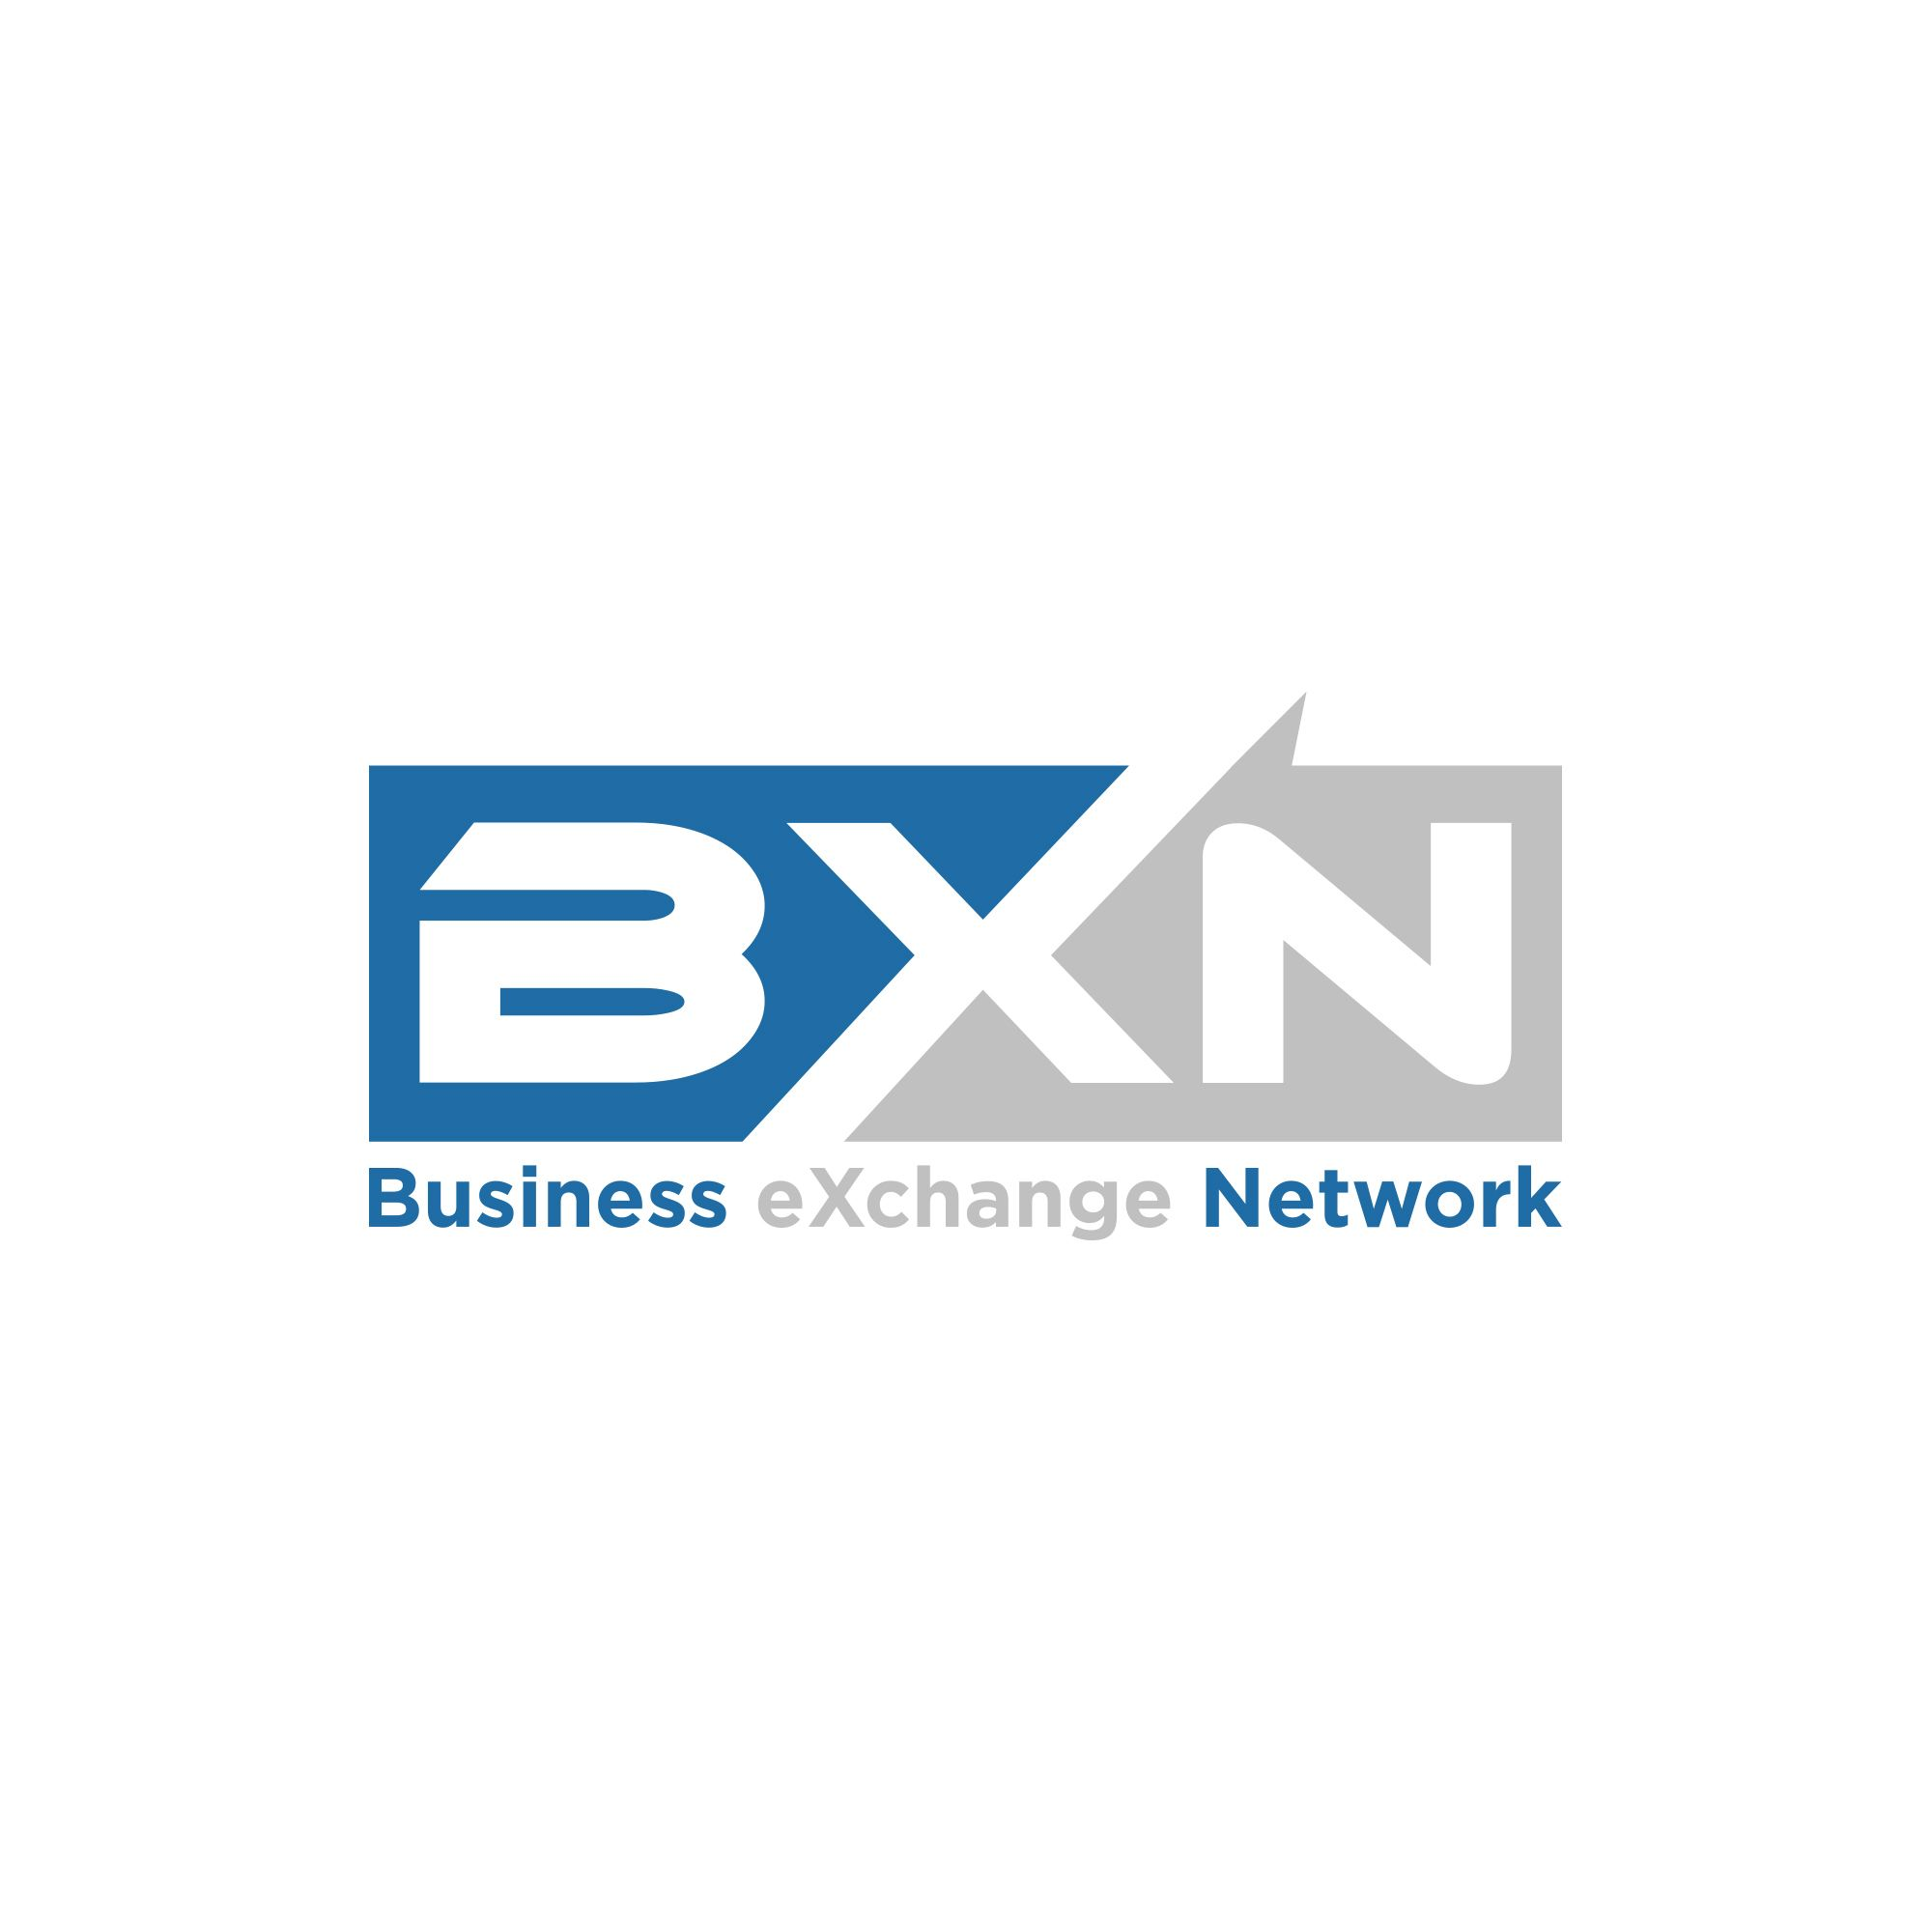 Business eXchange Network - BXN